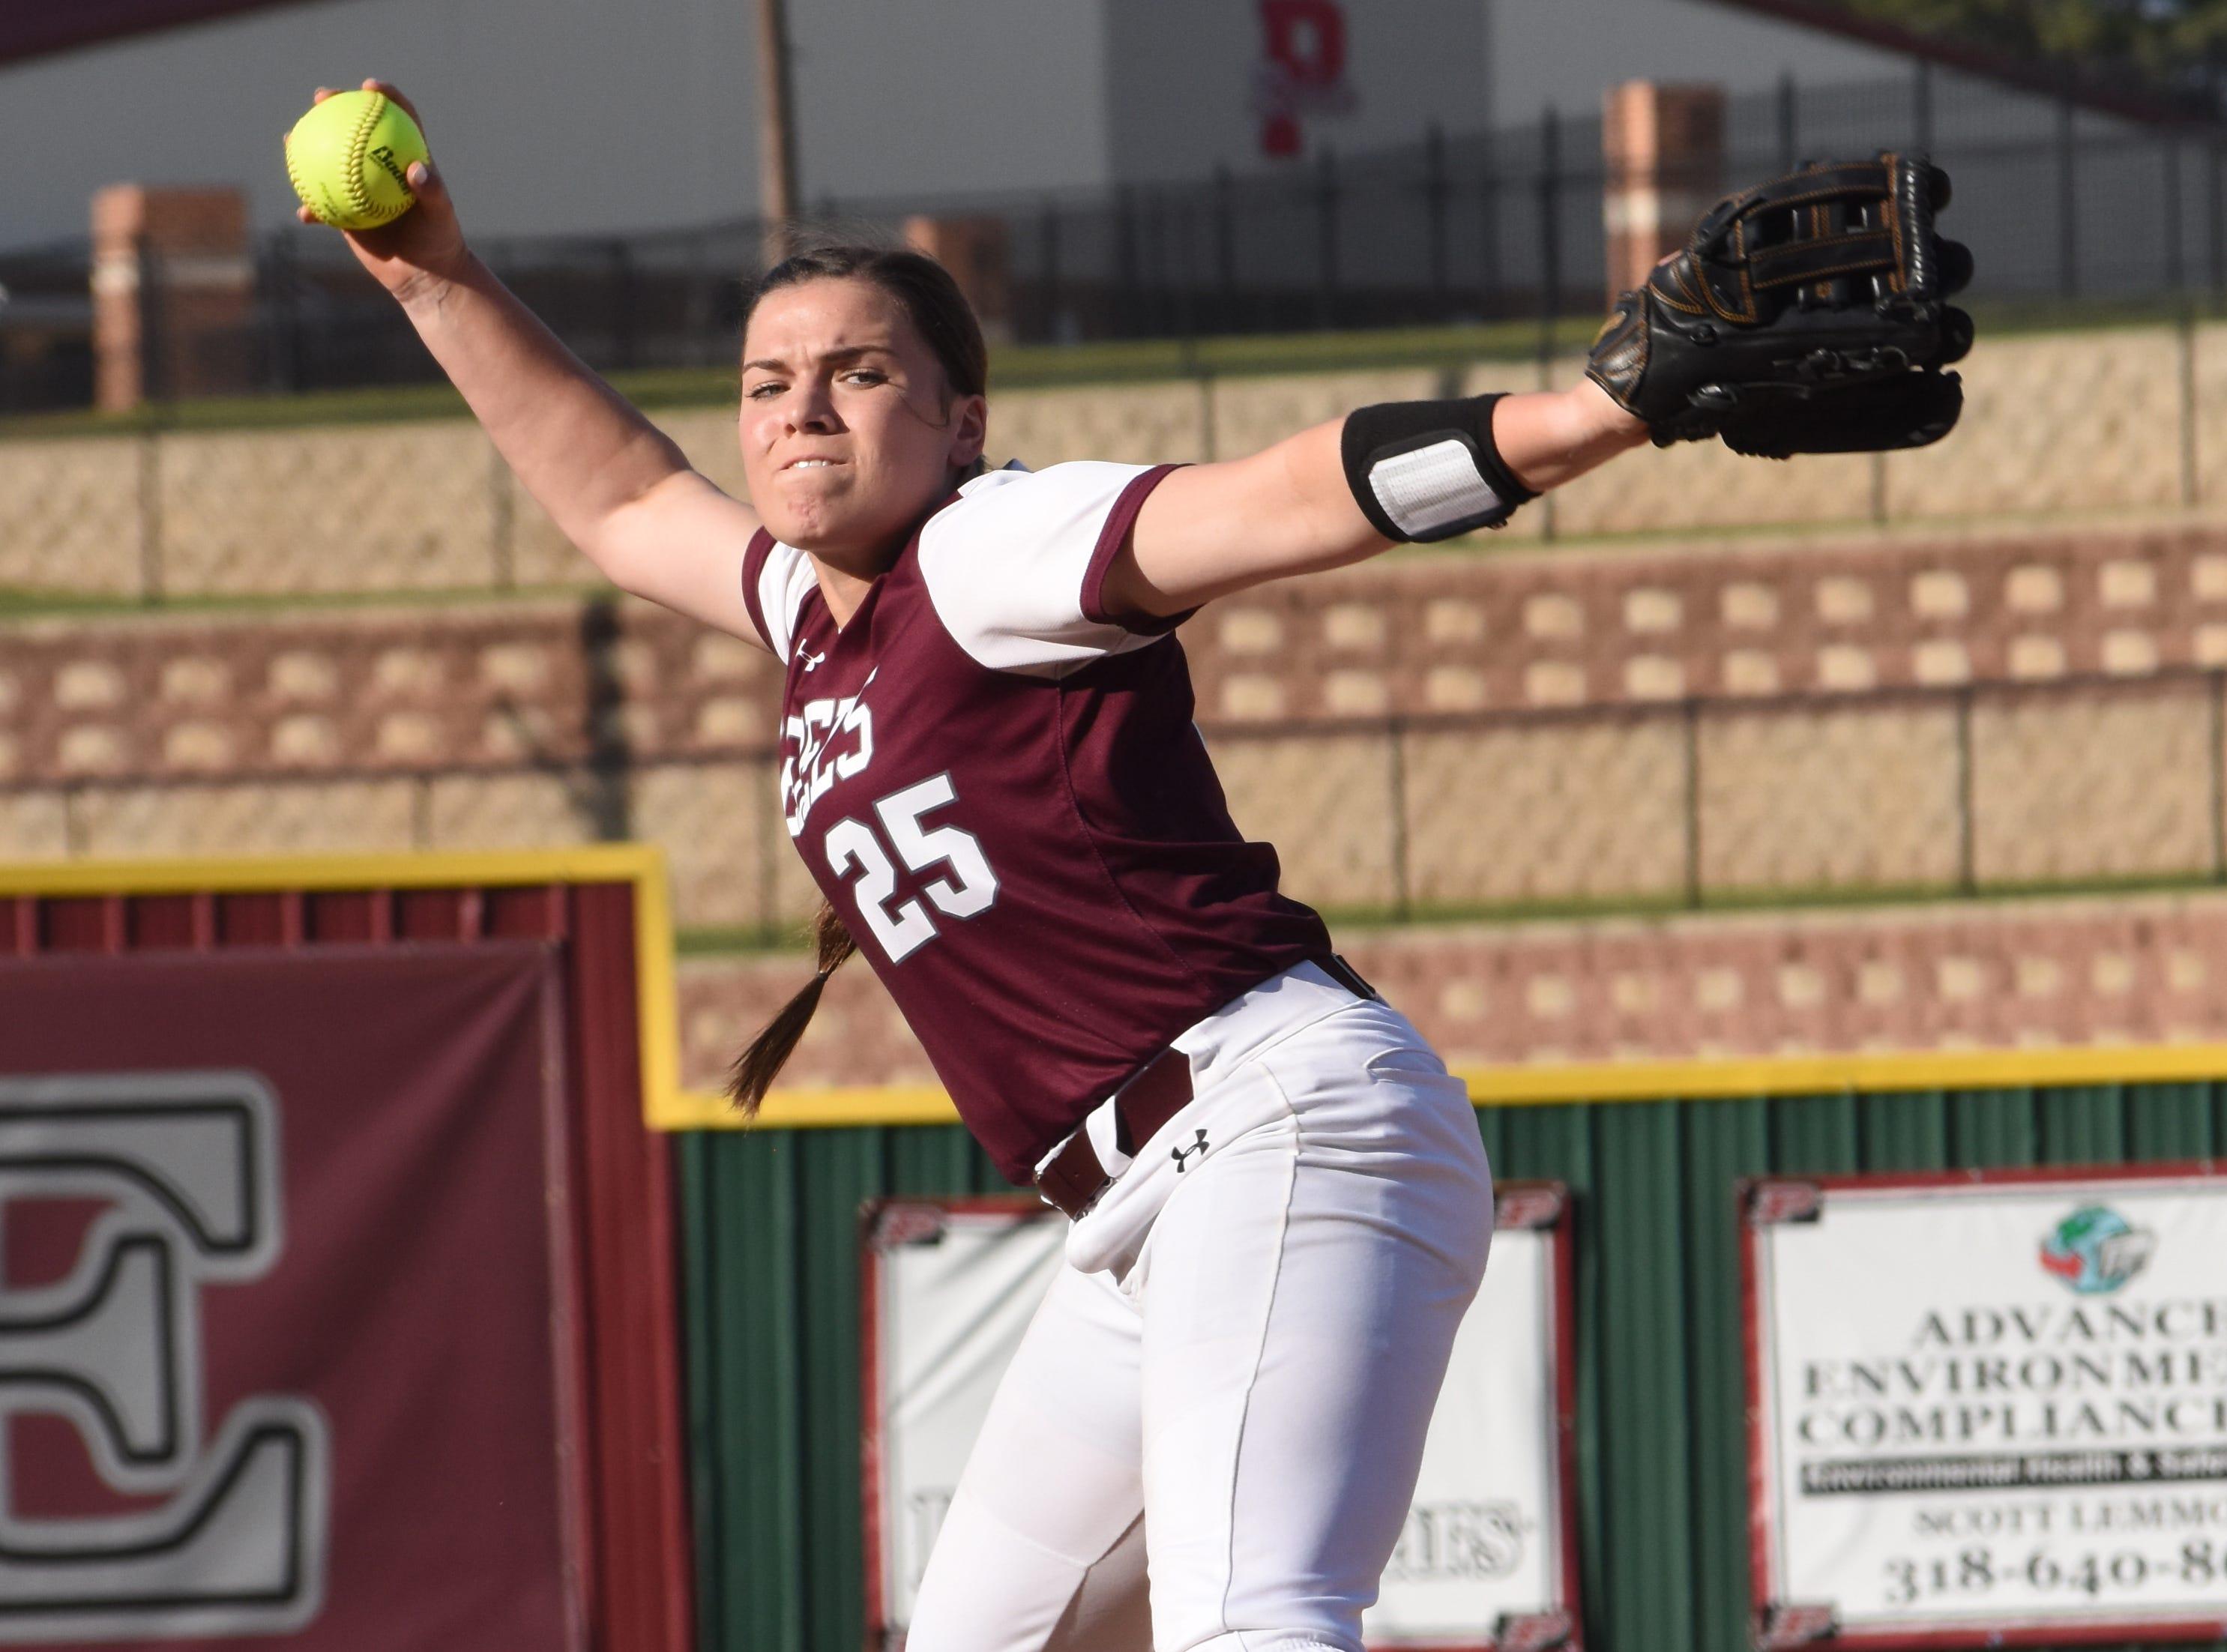 Pineville's Alexis Garoutte (25) fires a pitch against West Monroe High School Lady Rebels Thursday, March 28, 2019. West Monroe won 11-2.